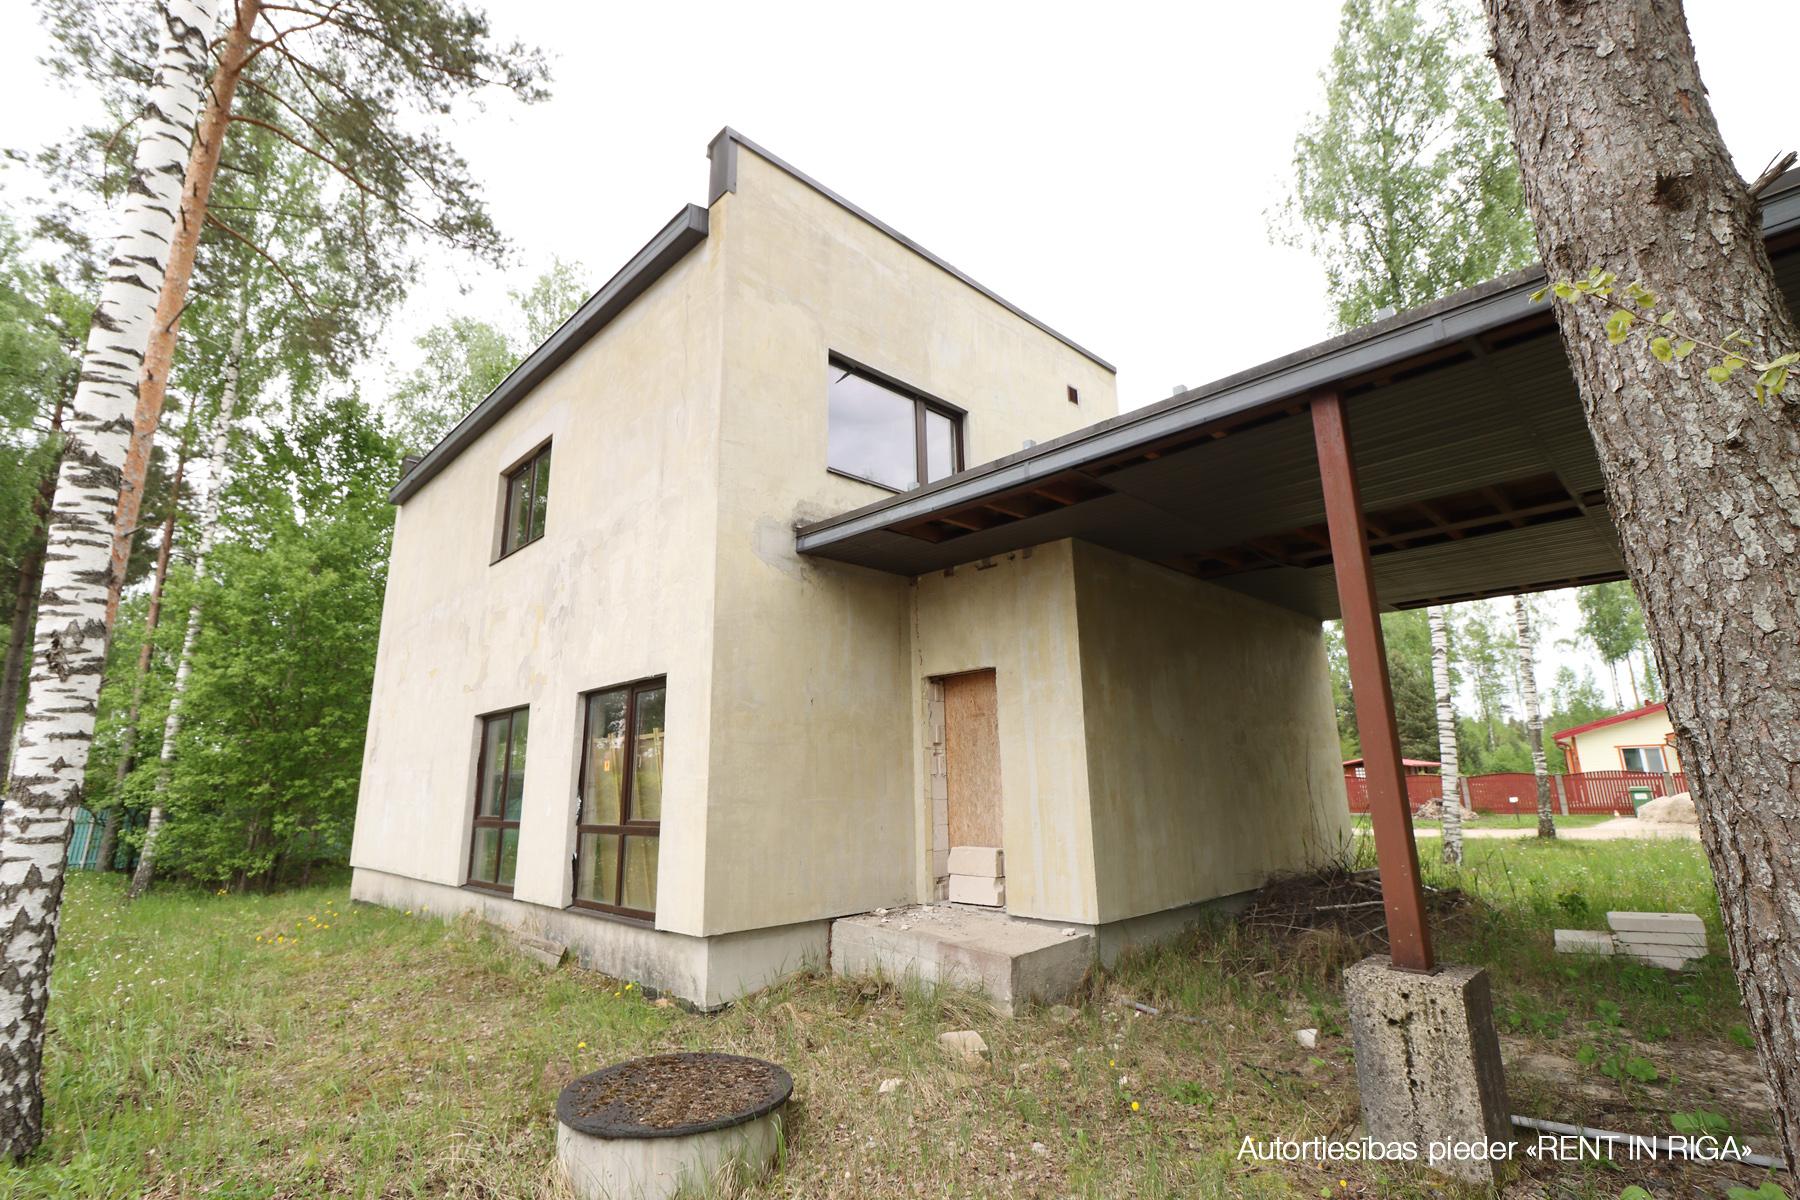 Pārdod māju, Ķirbju iela - Attēls 1